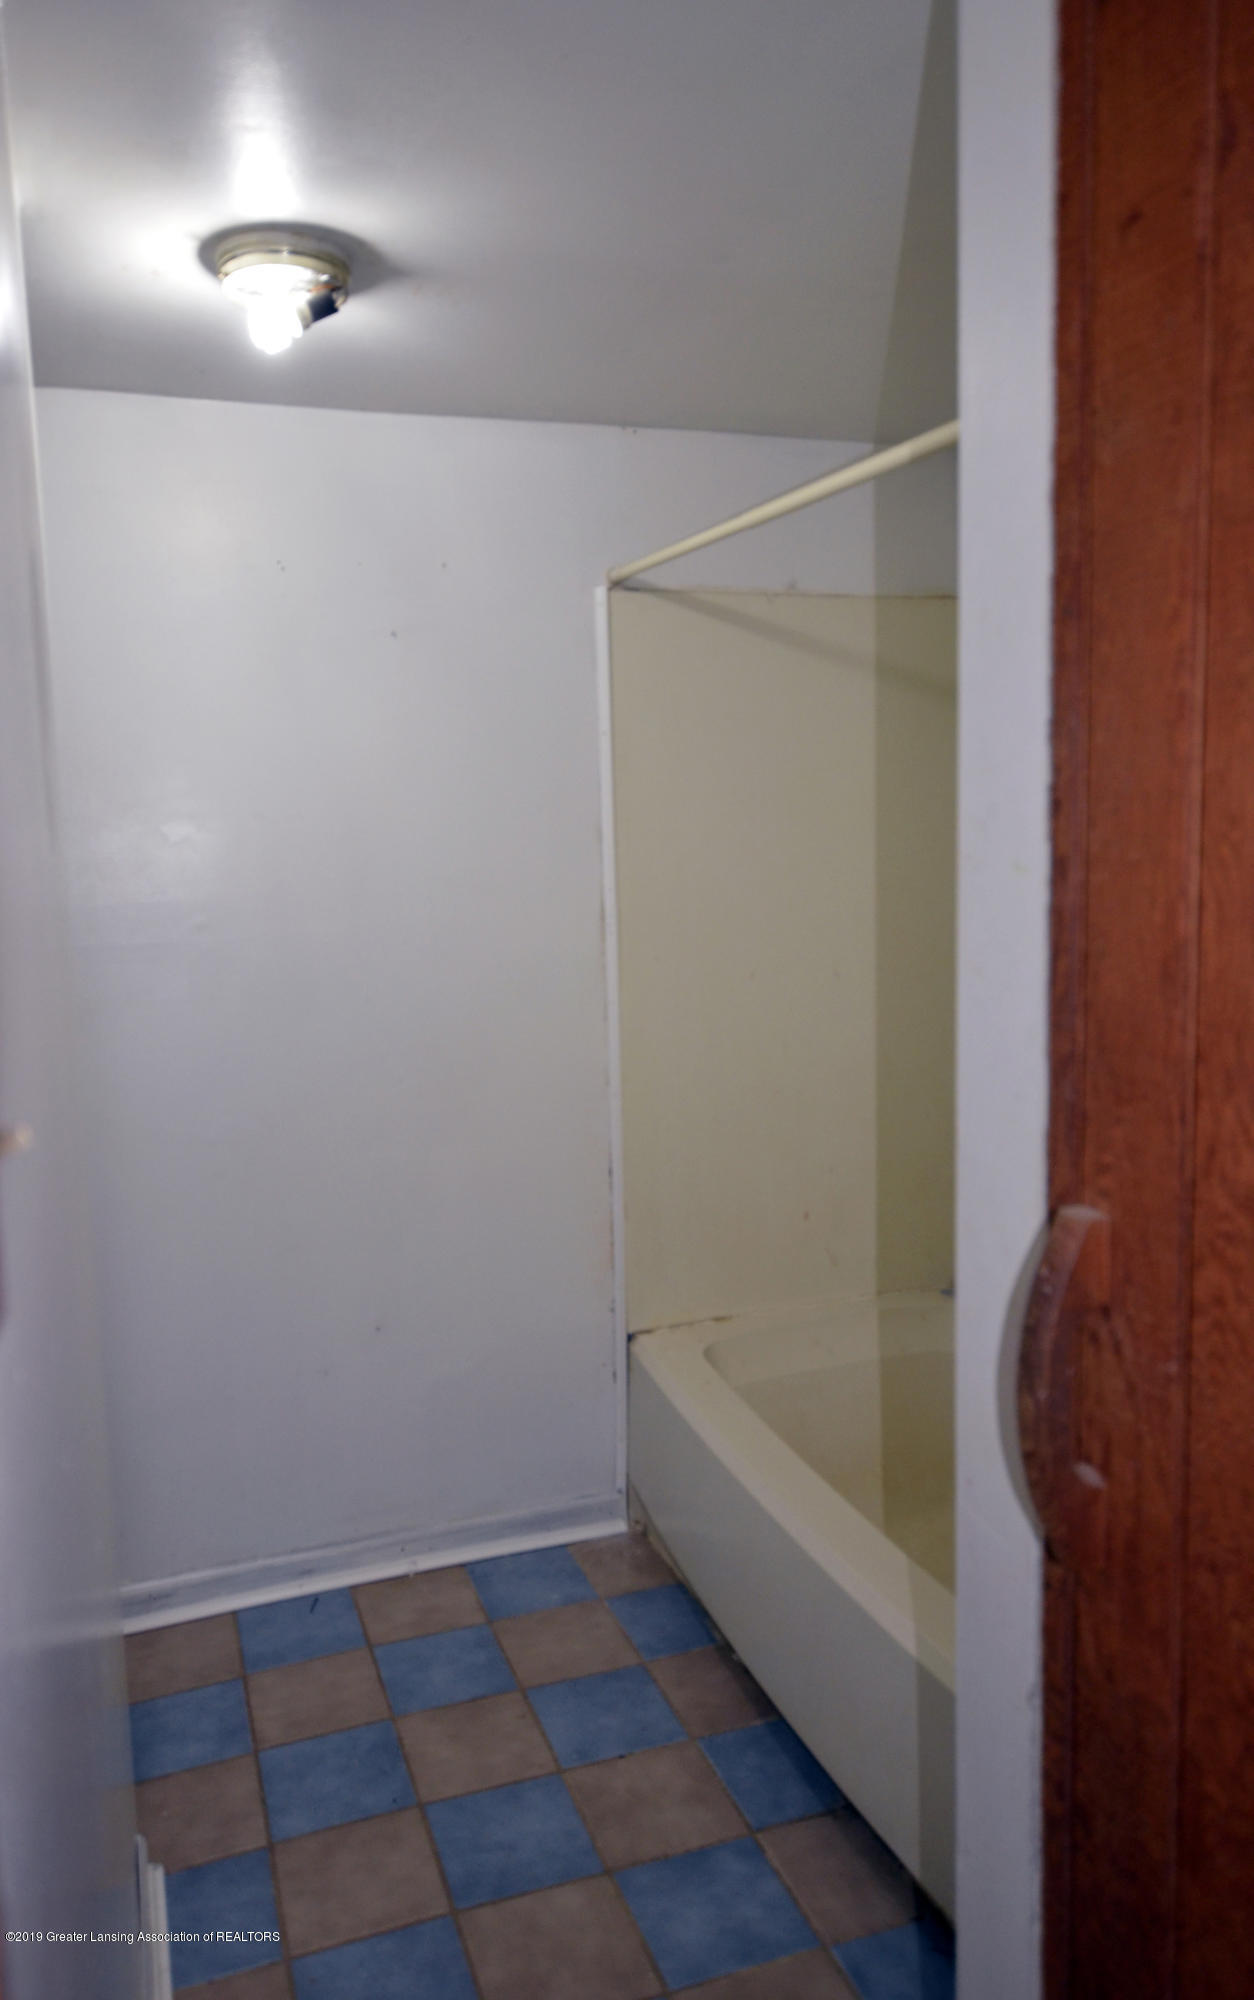 15871 Short St - 15871 Short St bathroom - 2